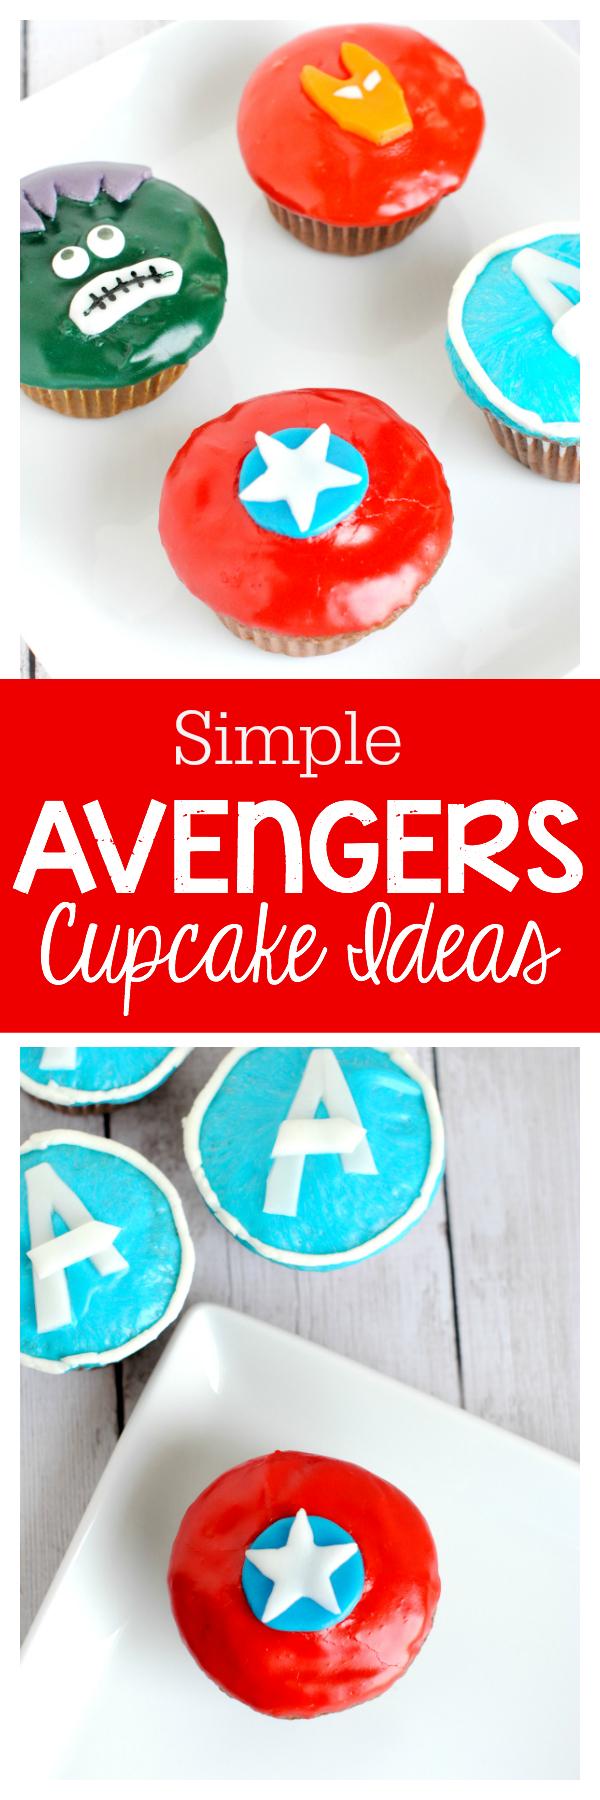 Simple (easy to make!) Avengers Cupcake Ideas